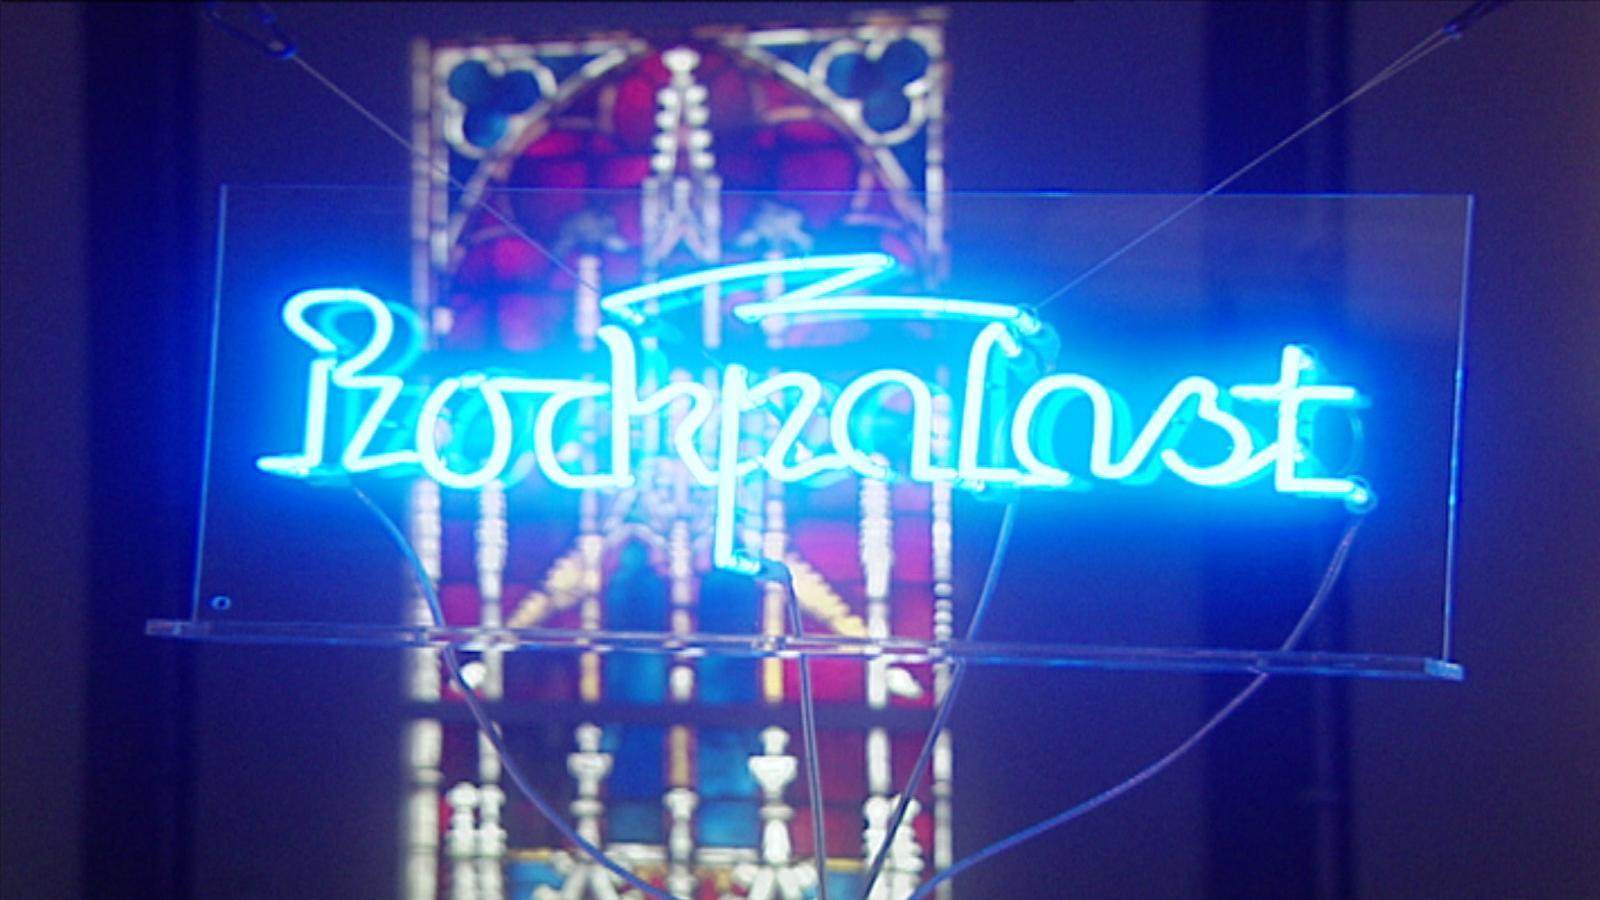 Wdr Rockpalast Mediathek